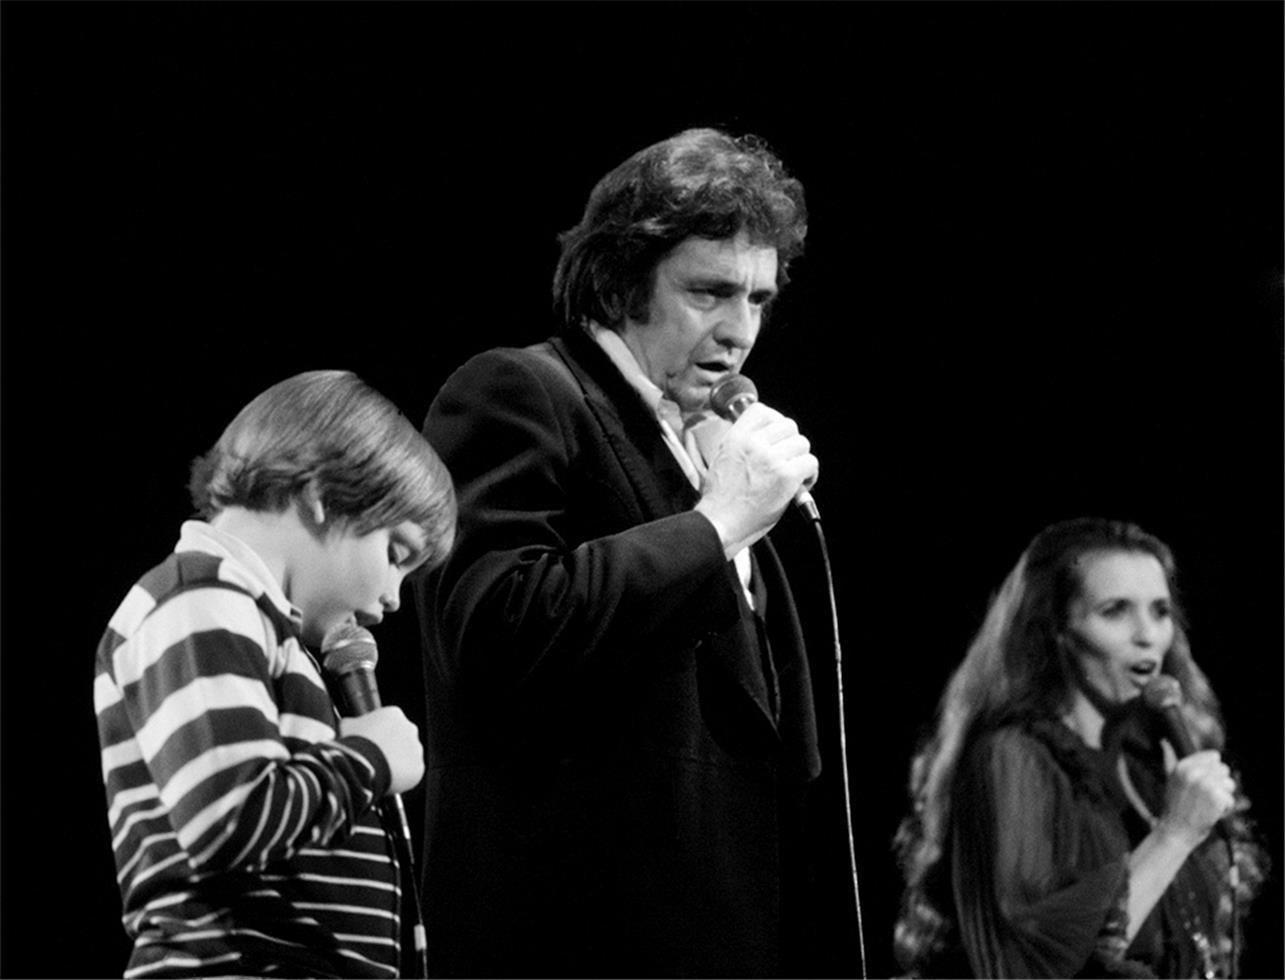 Johnny Cash, 1978